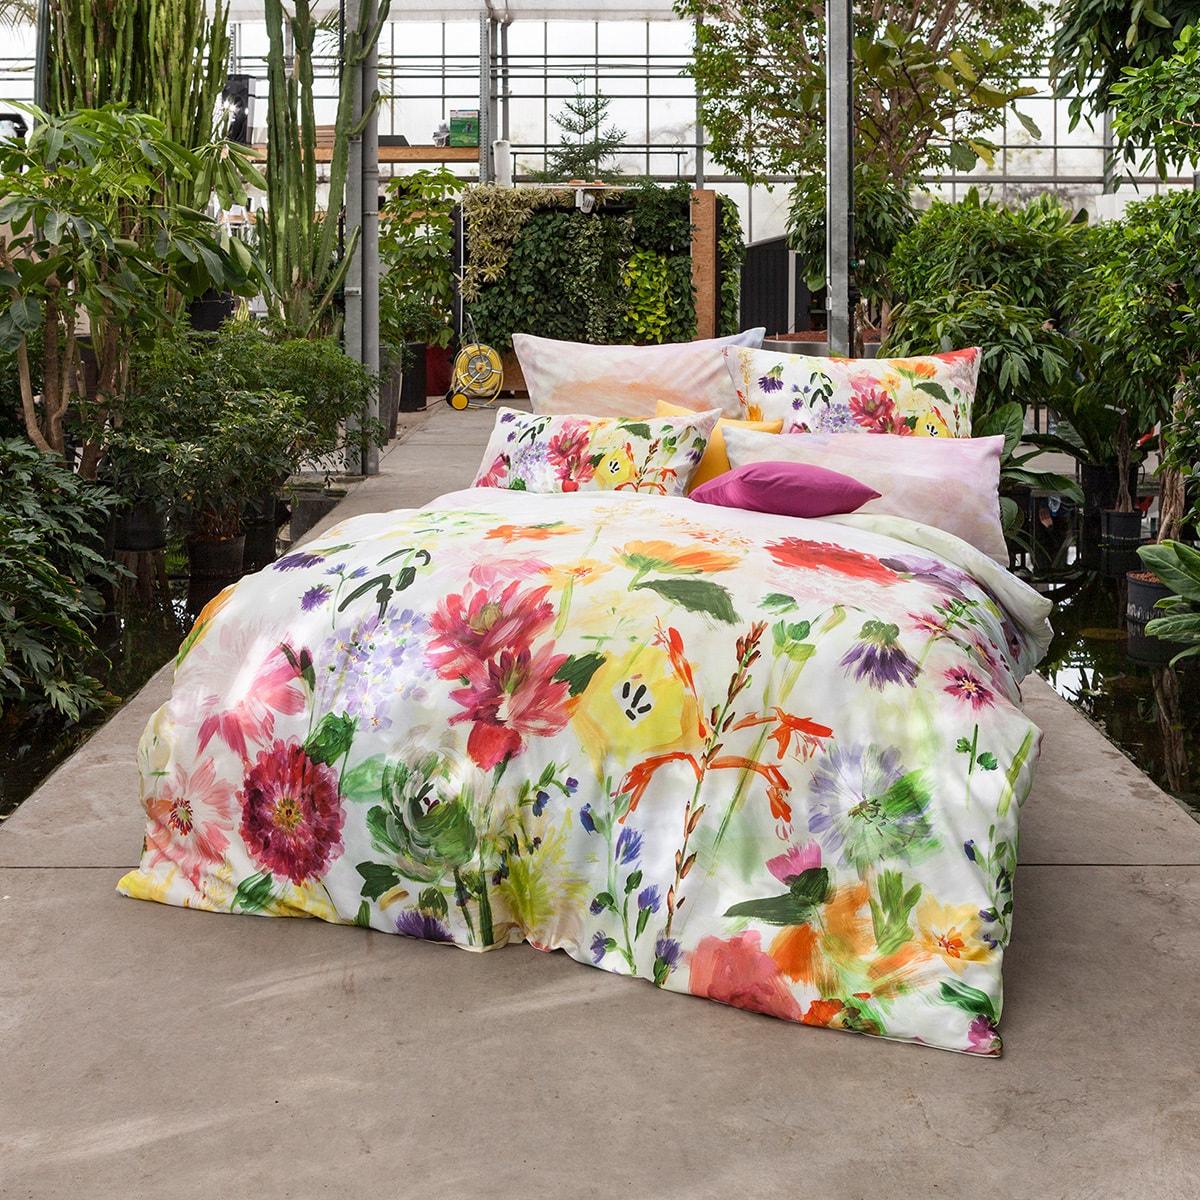 Estella Mako-Satin Bettwäsche Garden multicolor